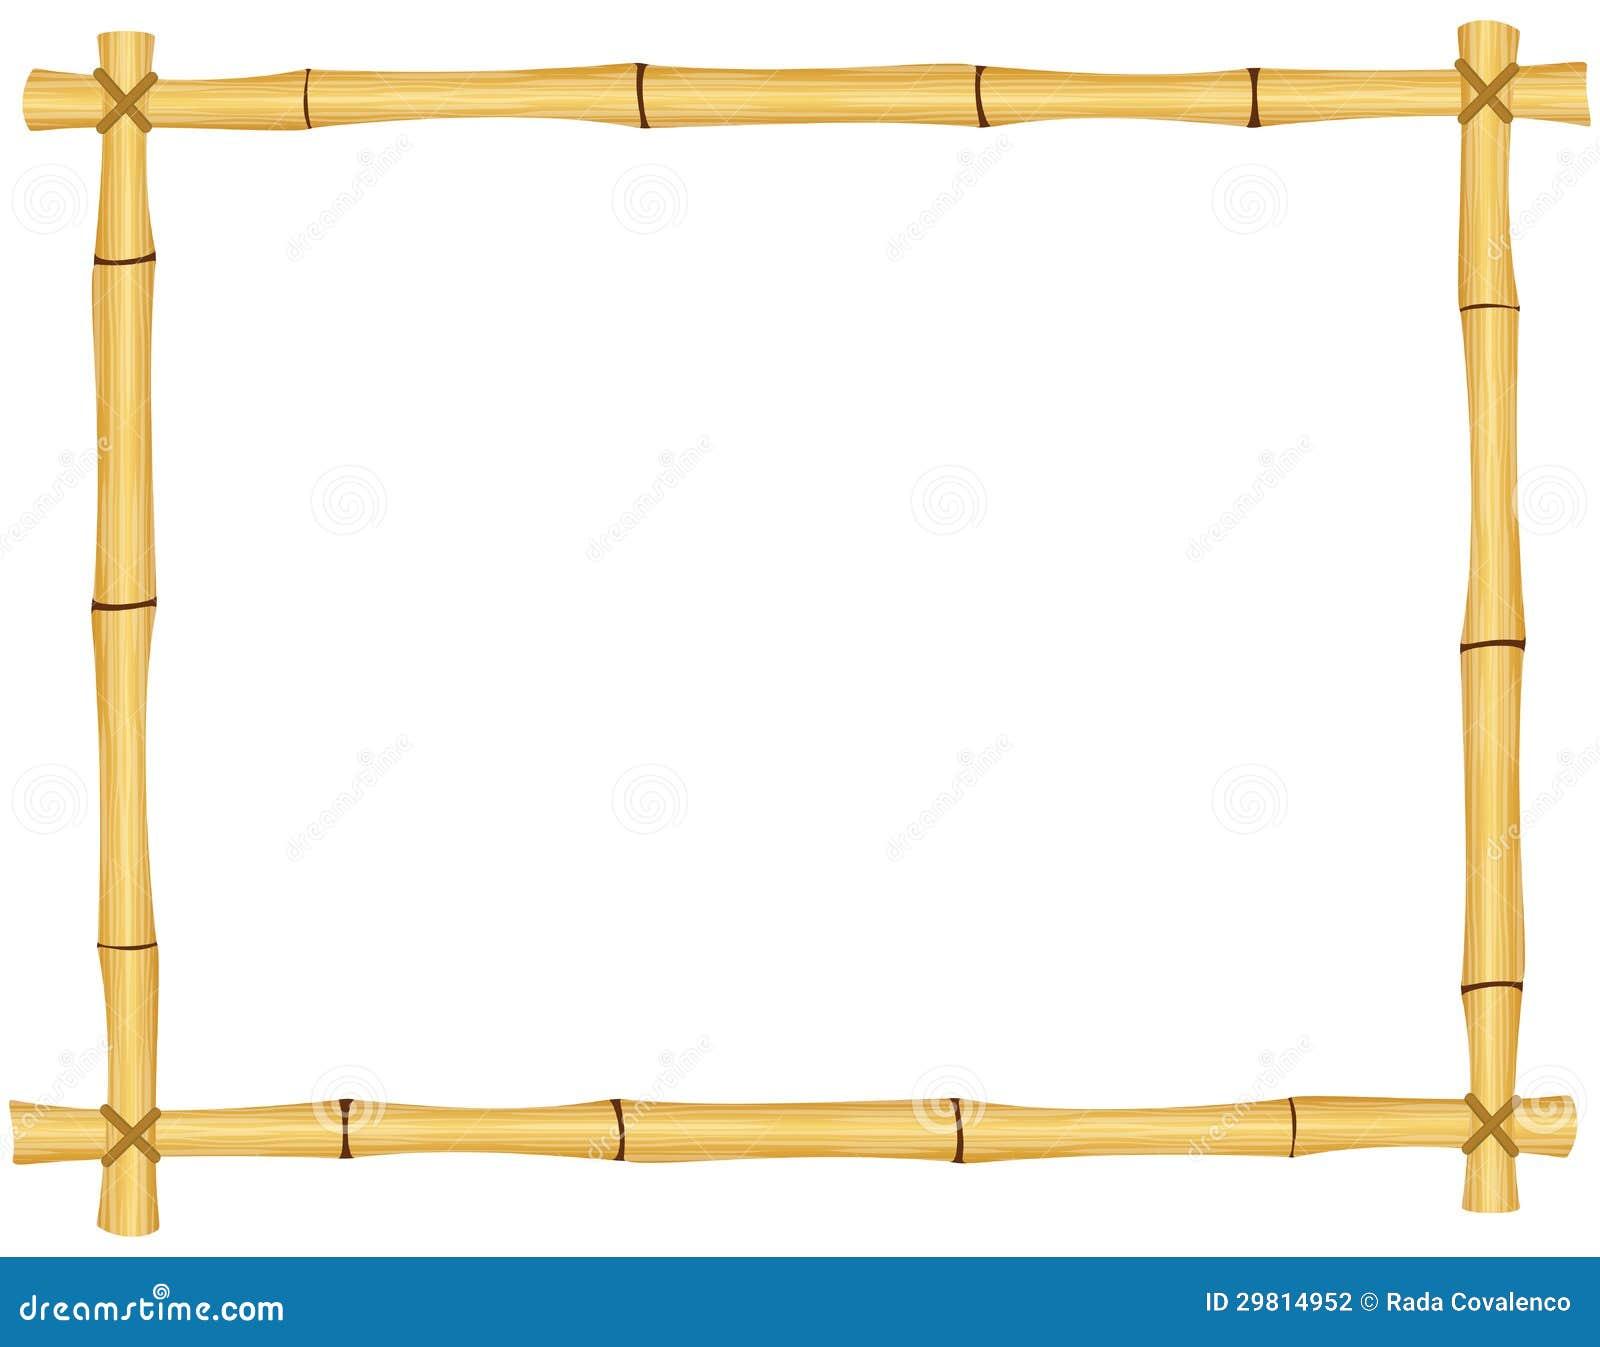 Bamboo Frame Stock Photography Image 29814952